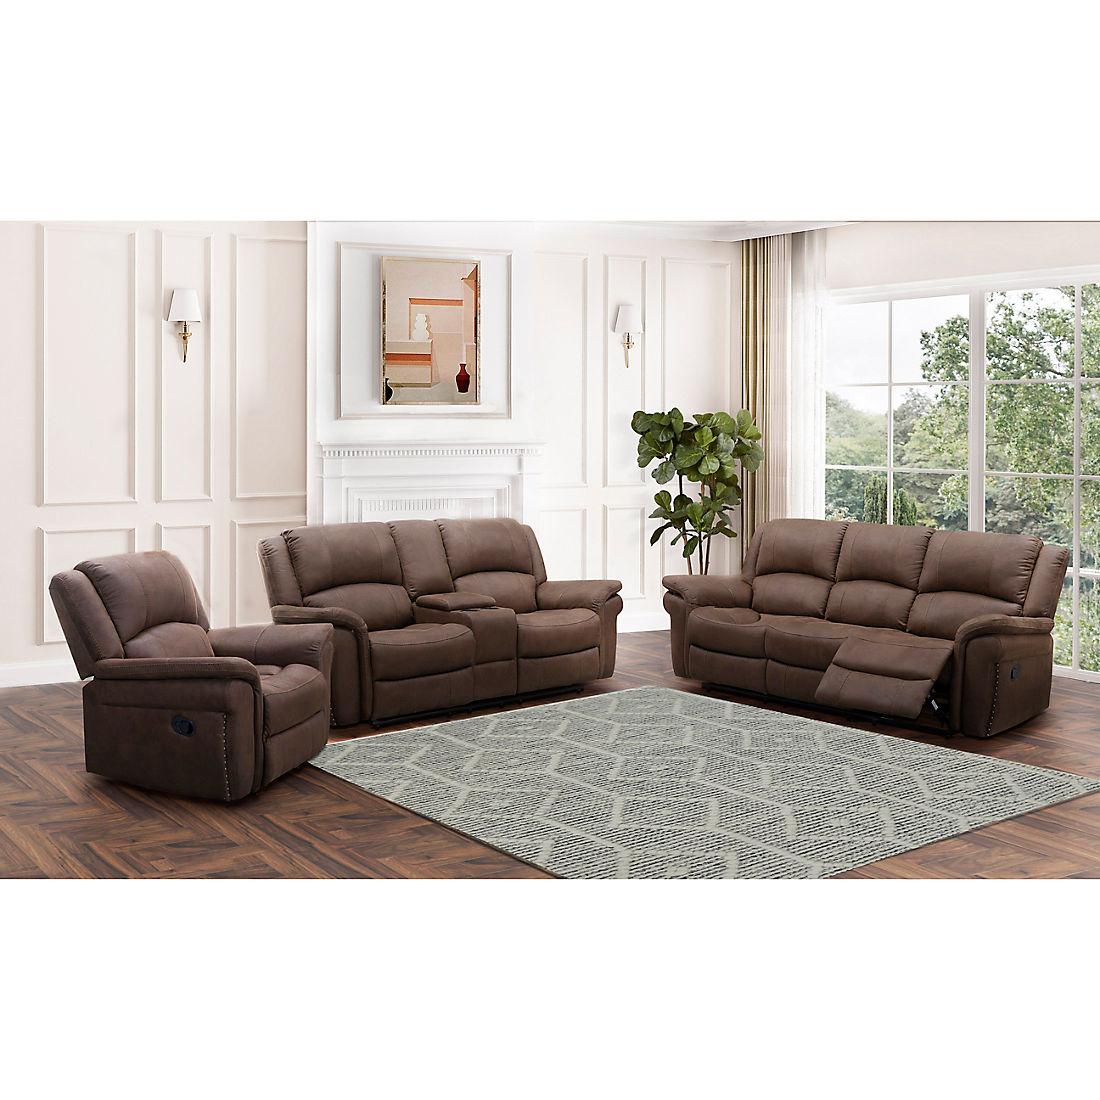 Abbyson Living Gordon Fabric Reclining, Brown Fabric Recliner Sofa Set